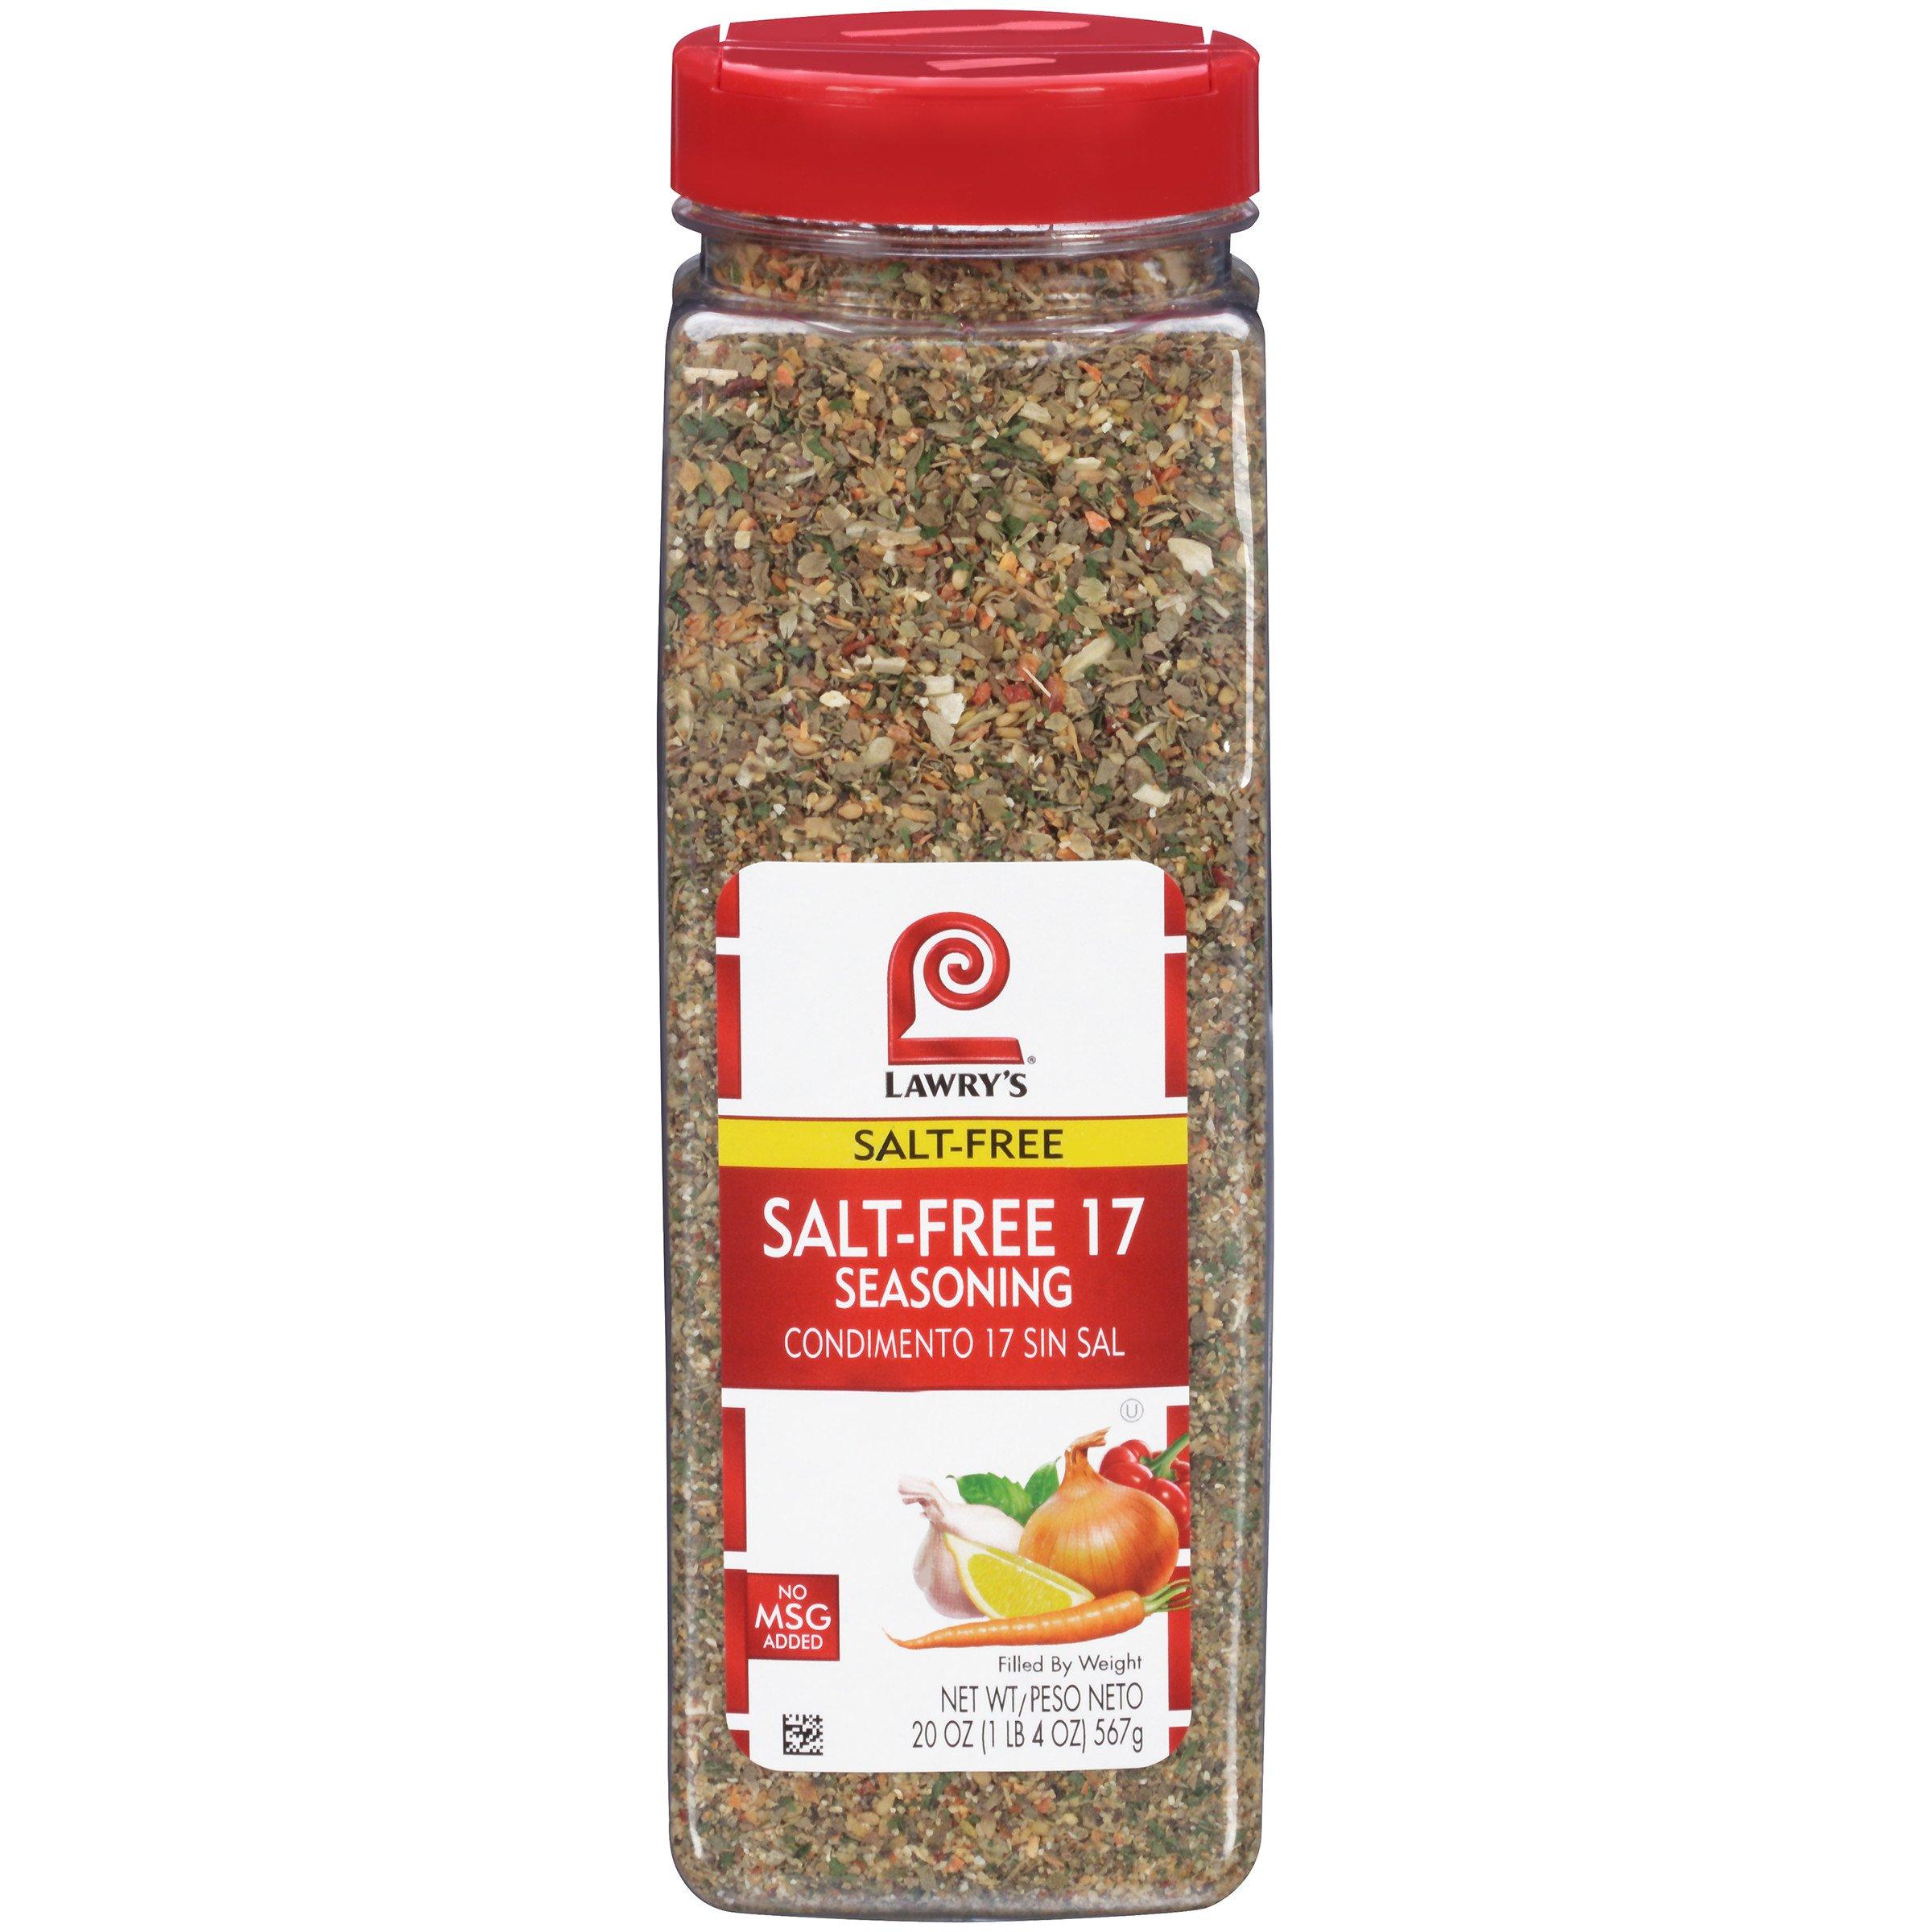 Lawry's Salt Free 17 Seasoning, All Purpose Seasoning, 20 oz